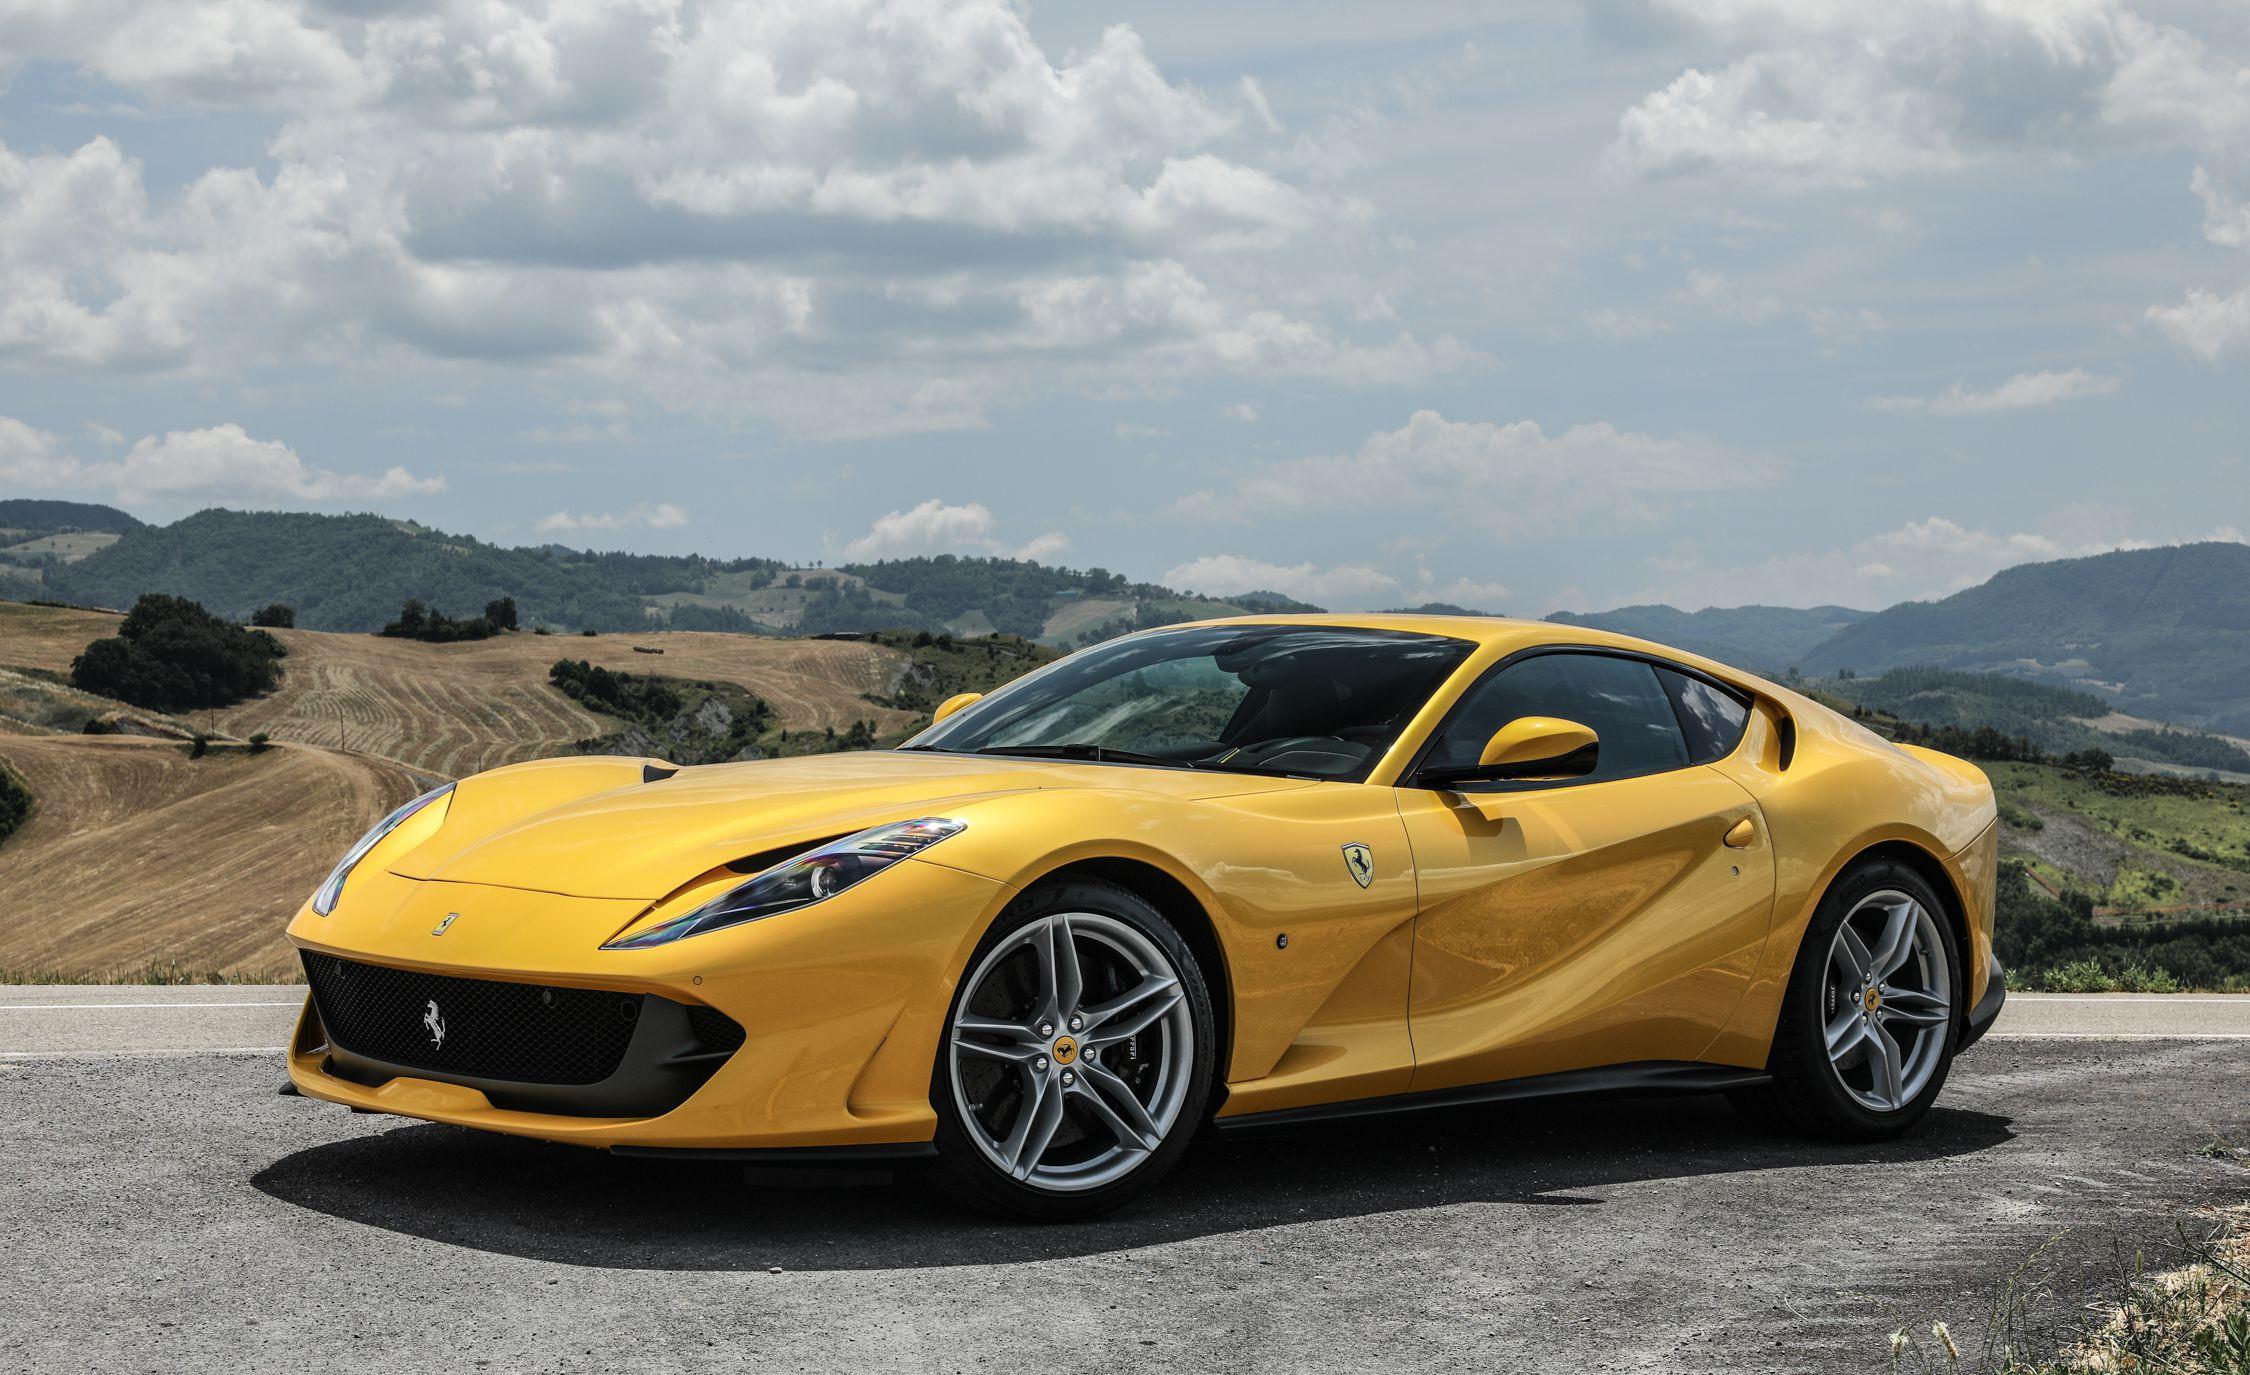 rent rome rental car aaa sport speciale hire luxury new ferrari